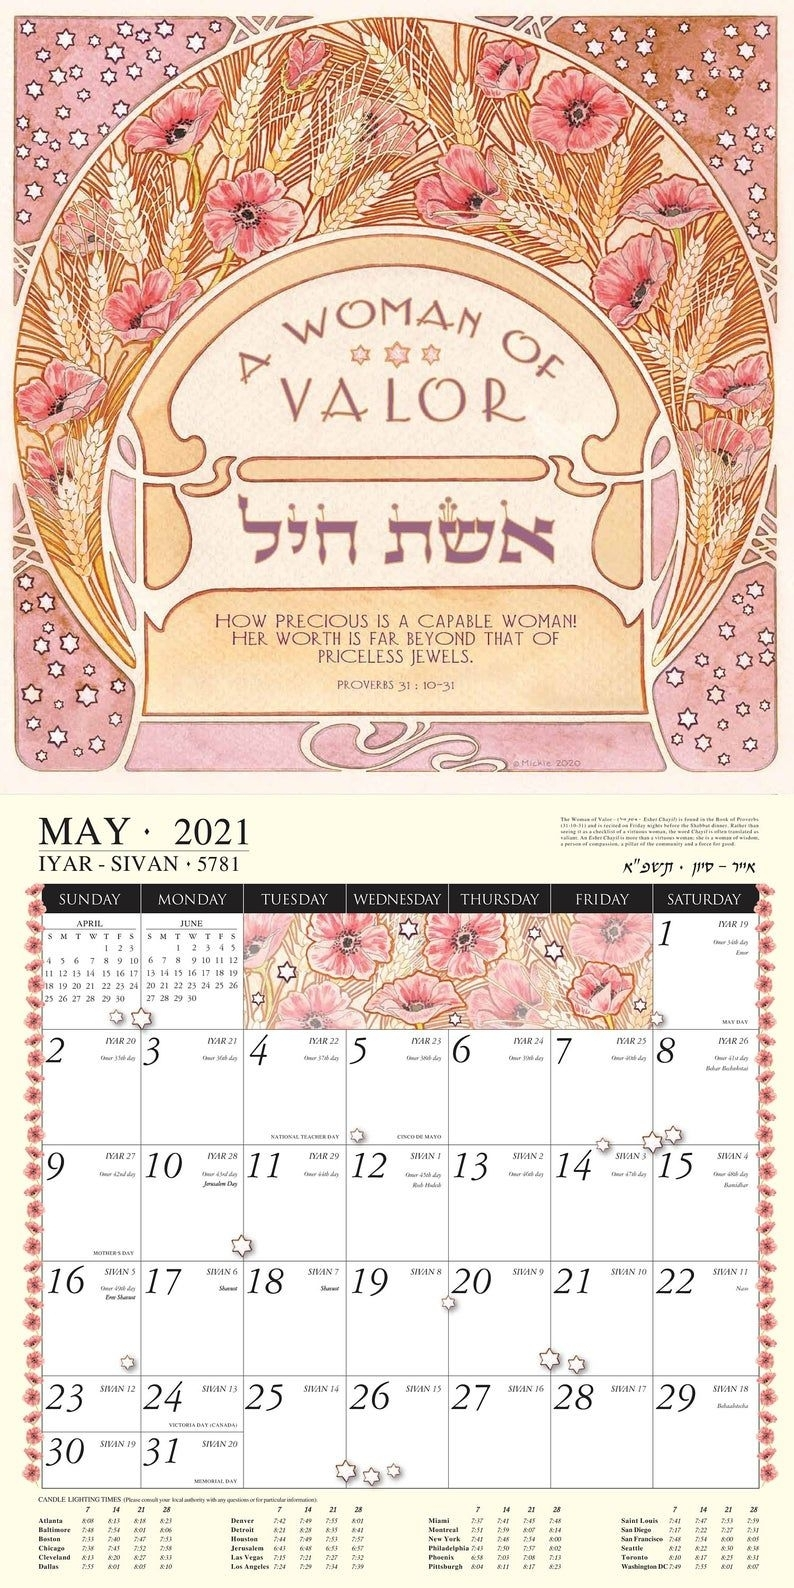 Get Jewish Feast September To December 2021